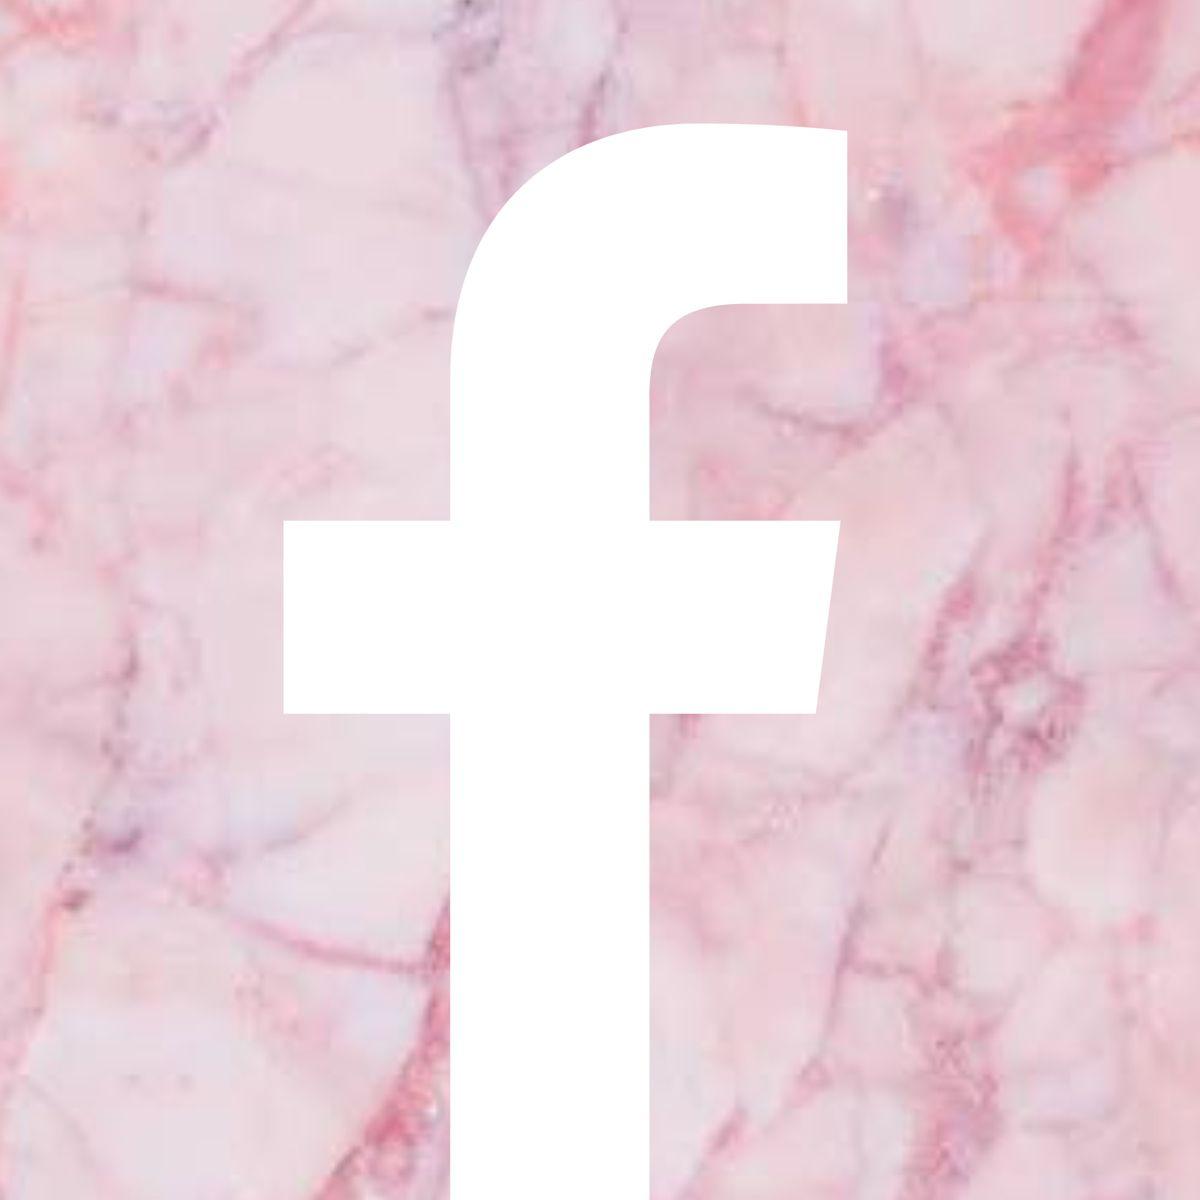 Pink Marble Facebook Iphone Wallpaper App Pink Wallpaper Iphone Baby Pink Wallpaper Iphone